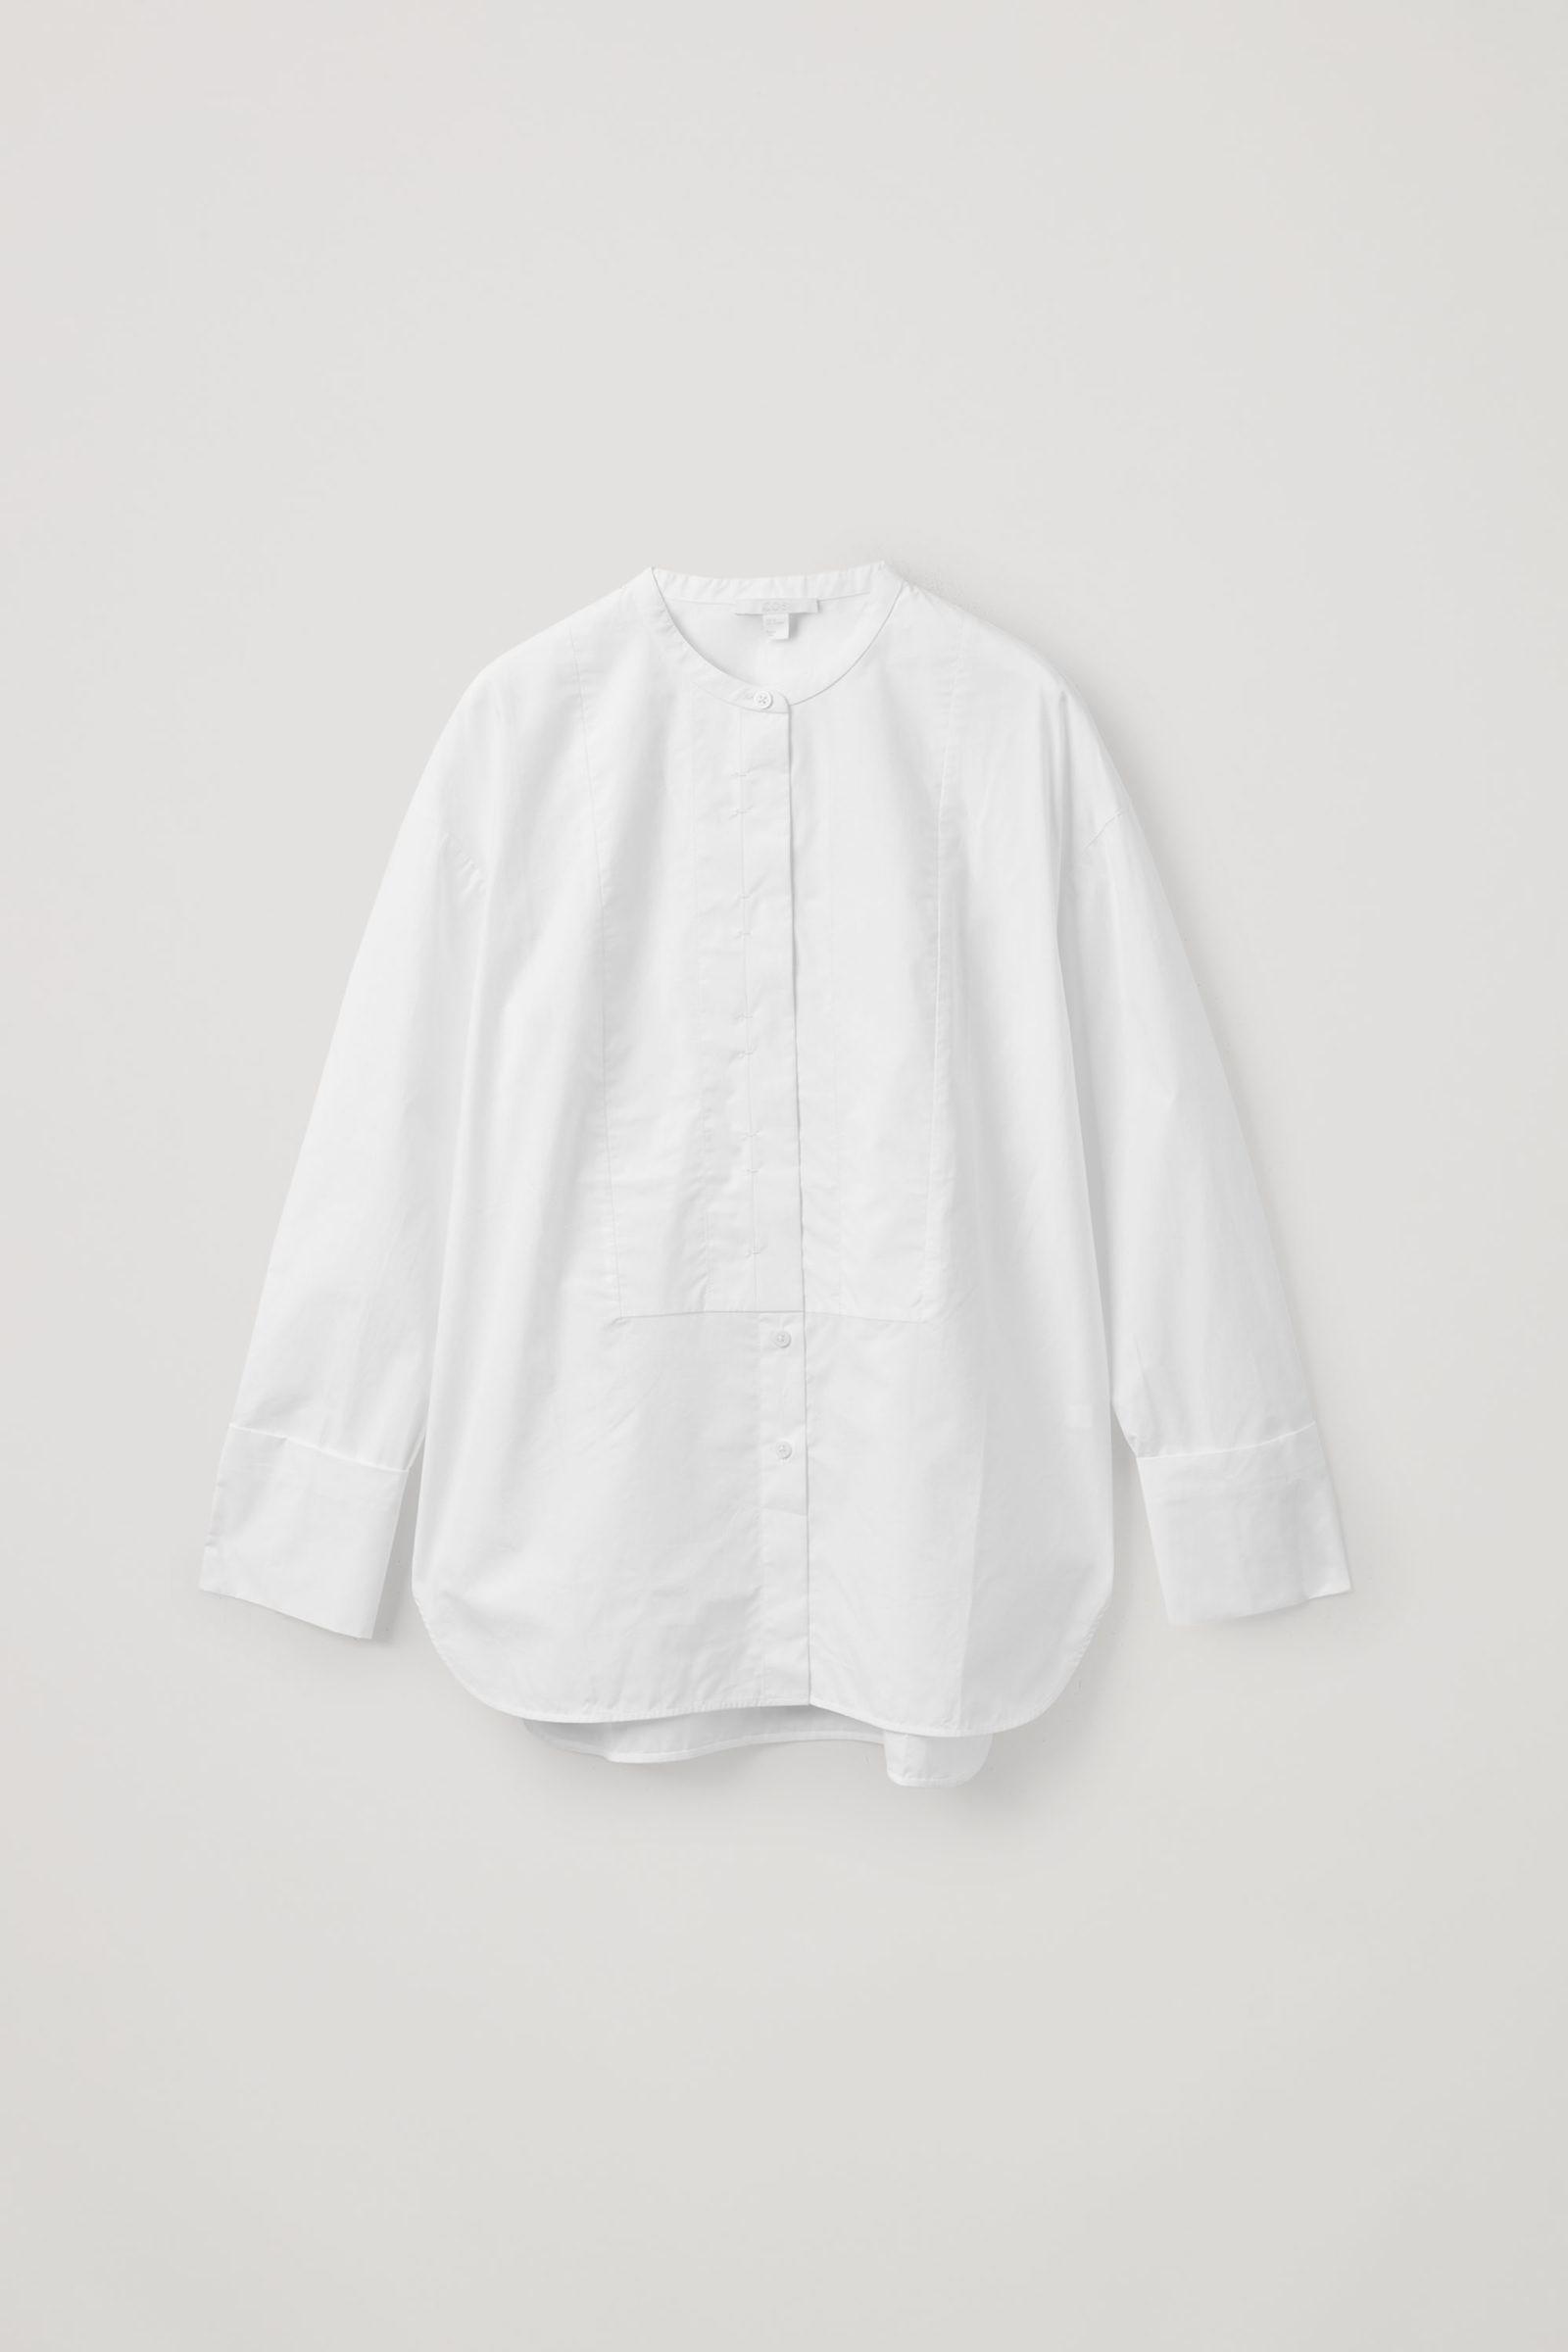 COS 코튼 빕 인서트 튜닉 스타일 셔츠의 화이트컬러 Product입니다.